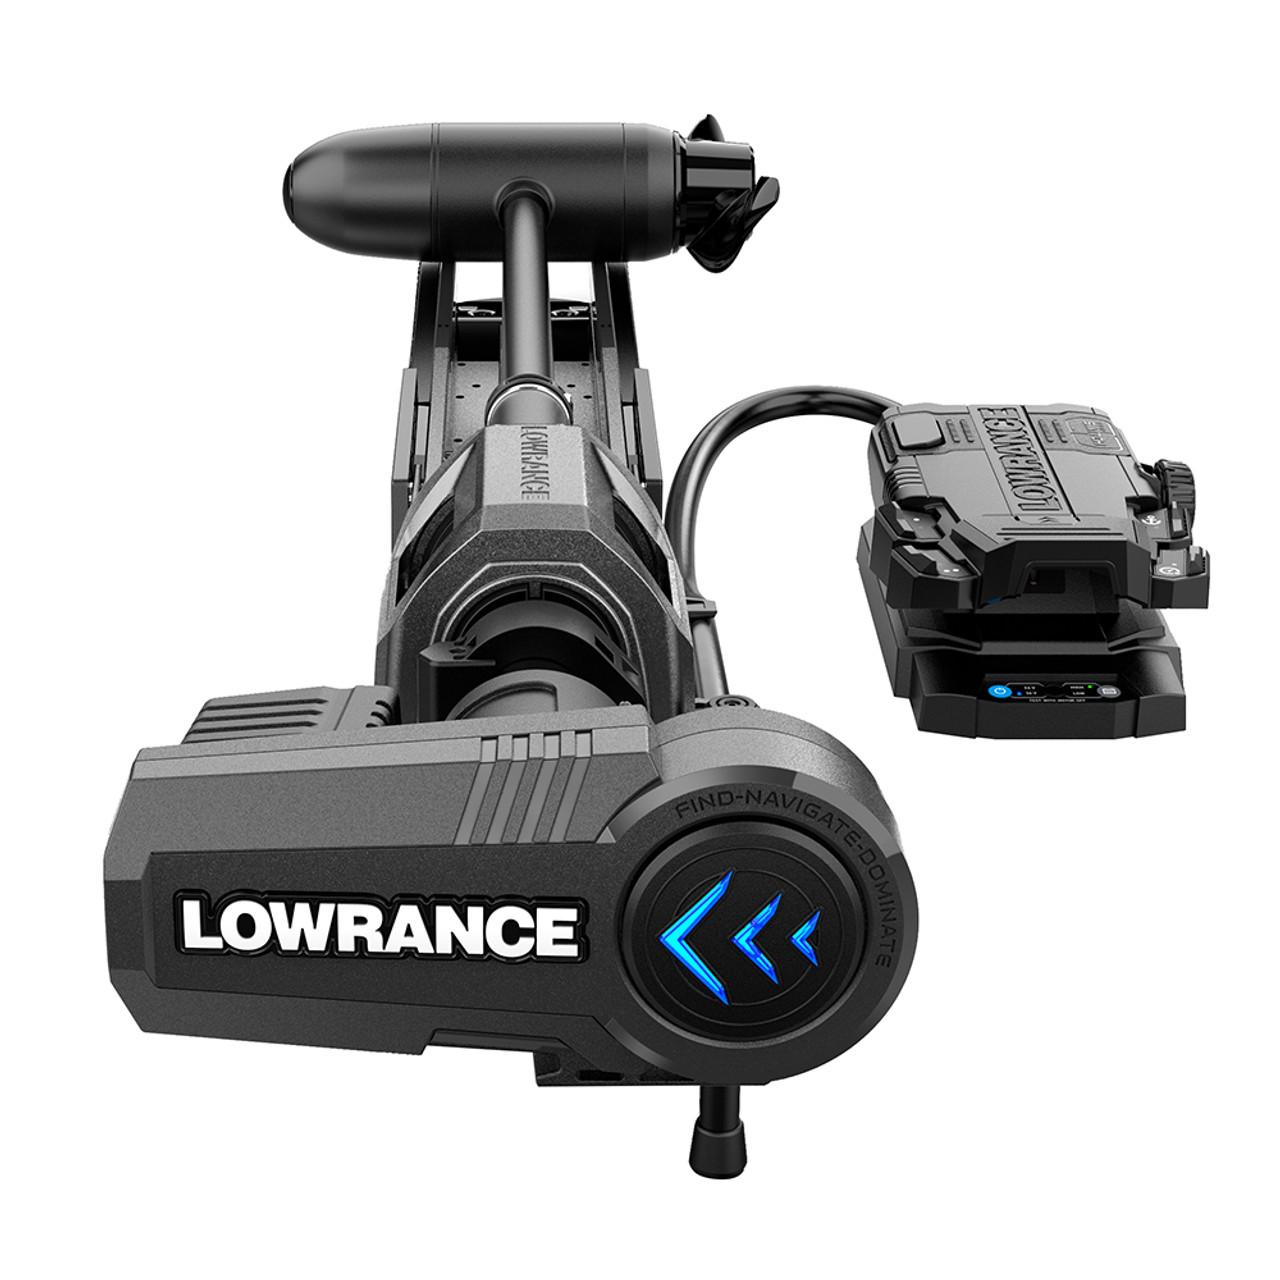 Lowrance Ghost Trolling Motor 47 U0026quot  Shaft F  24v Or 36v Systems  000